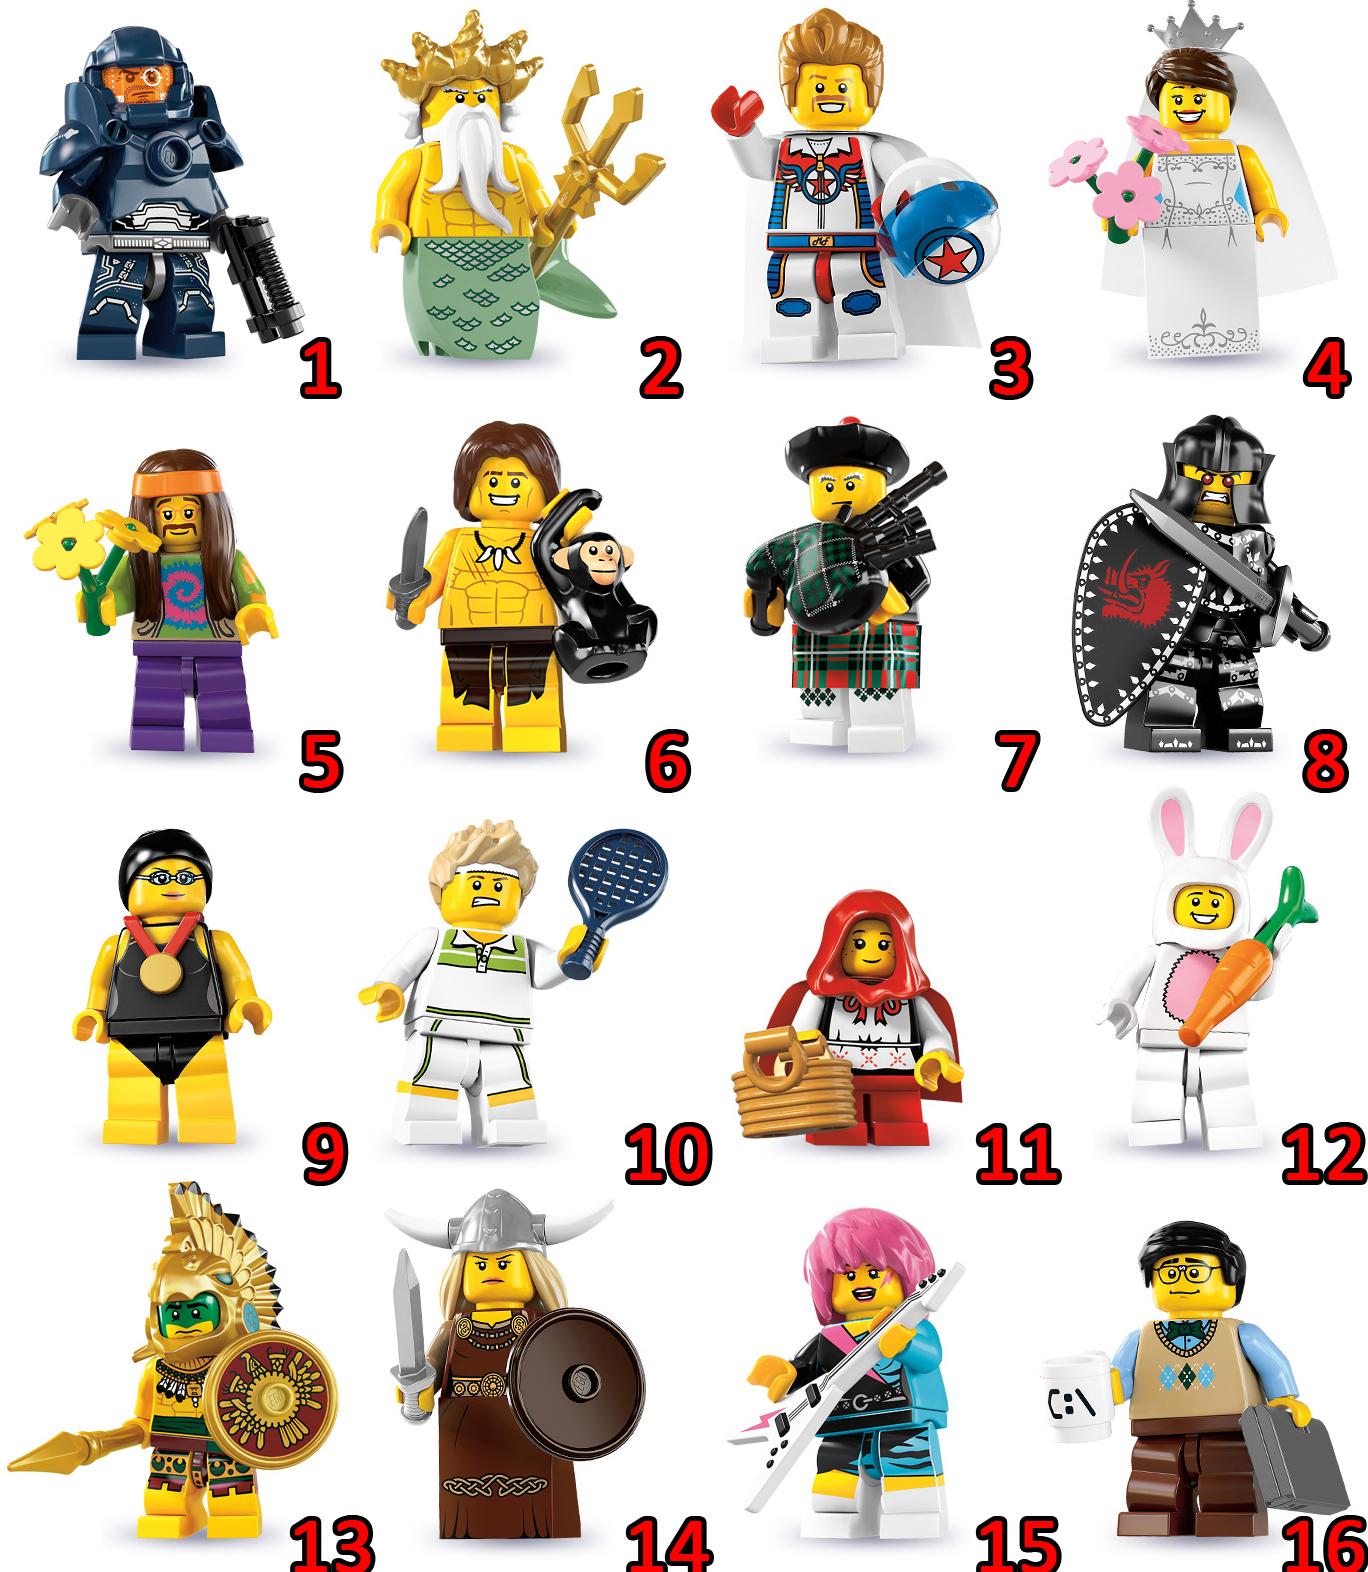 LEGO LEGO Minifigures, Series 7 Instructions 8831, Mini Figures